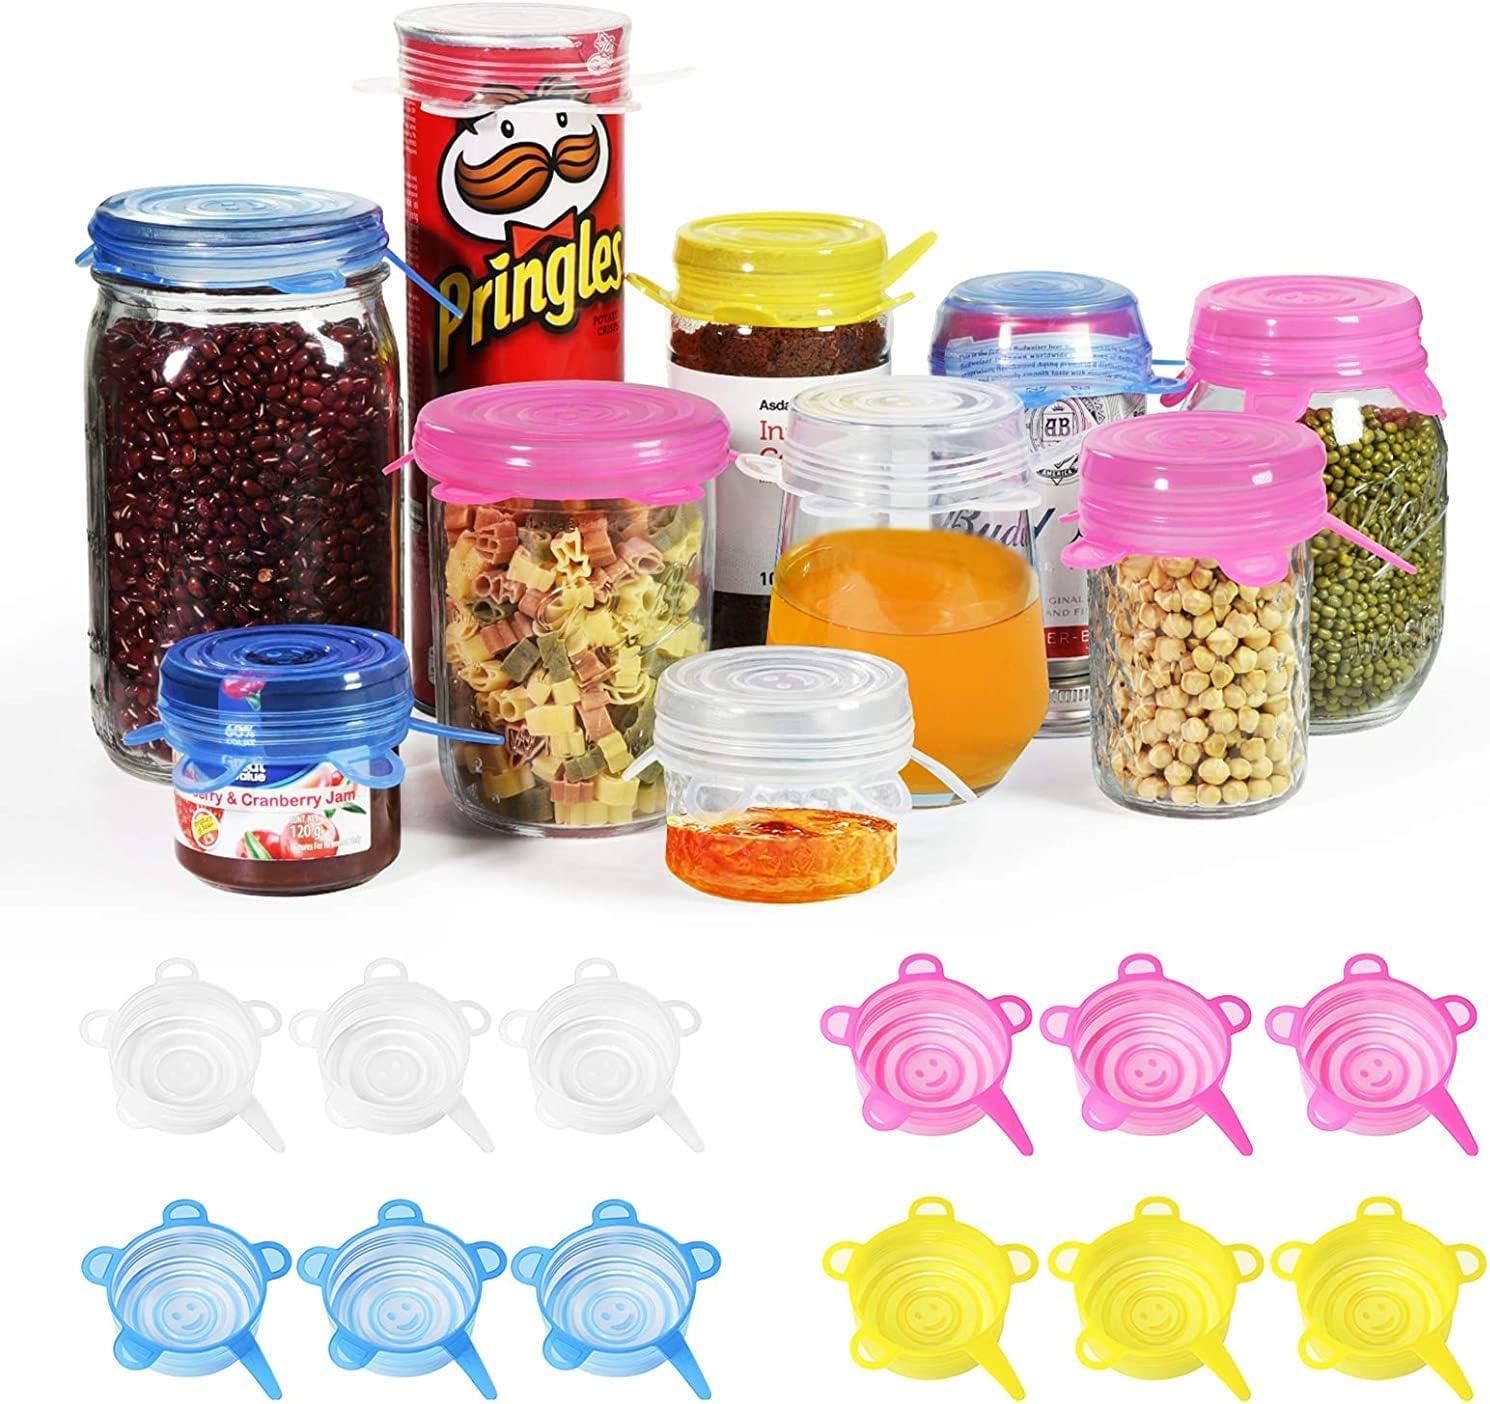 longzon Tapas Silicona Ajustables Cocina, 18 piezas de Tapas de Silicona Reutilizables Ecológicas de 6.5cm, Tapas Silicona para Latas, Sin BPA, para Lavavajillas, Microondas, Refrigerador - Redonda